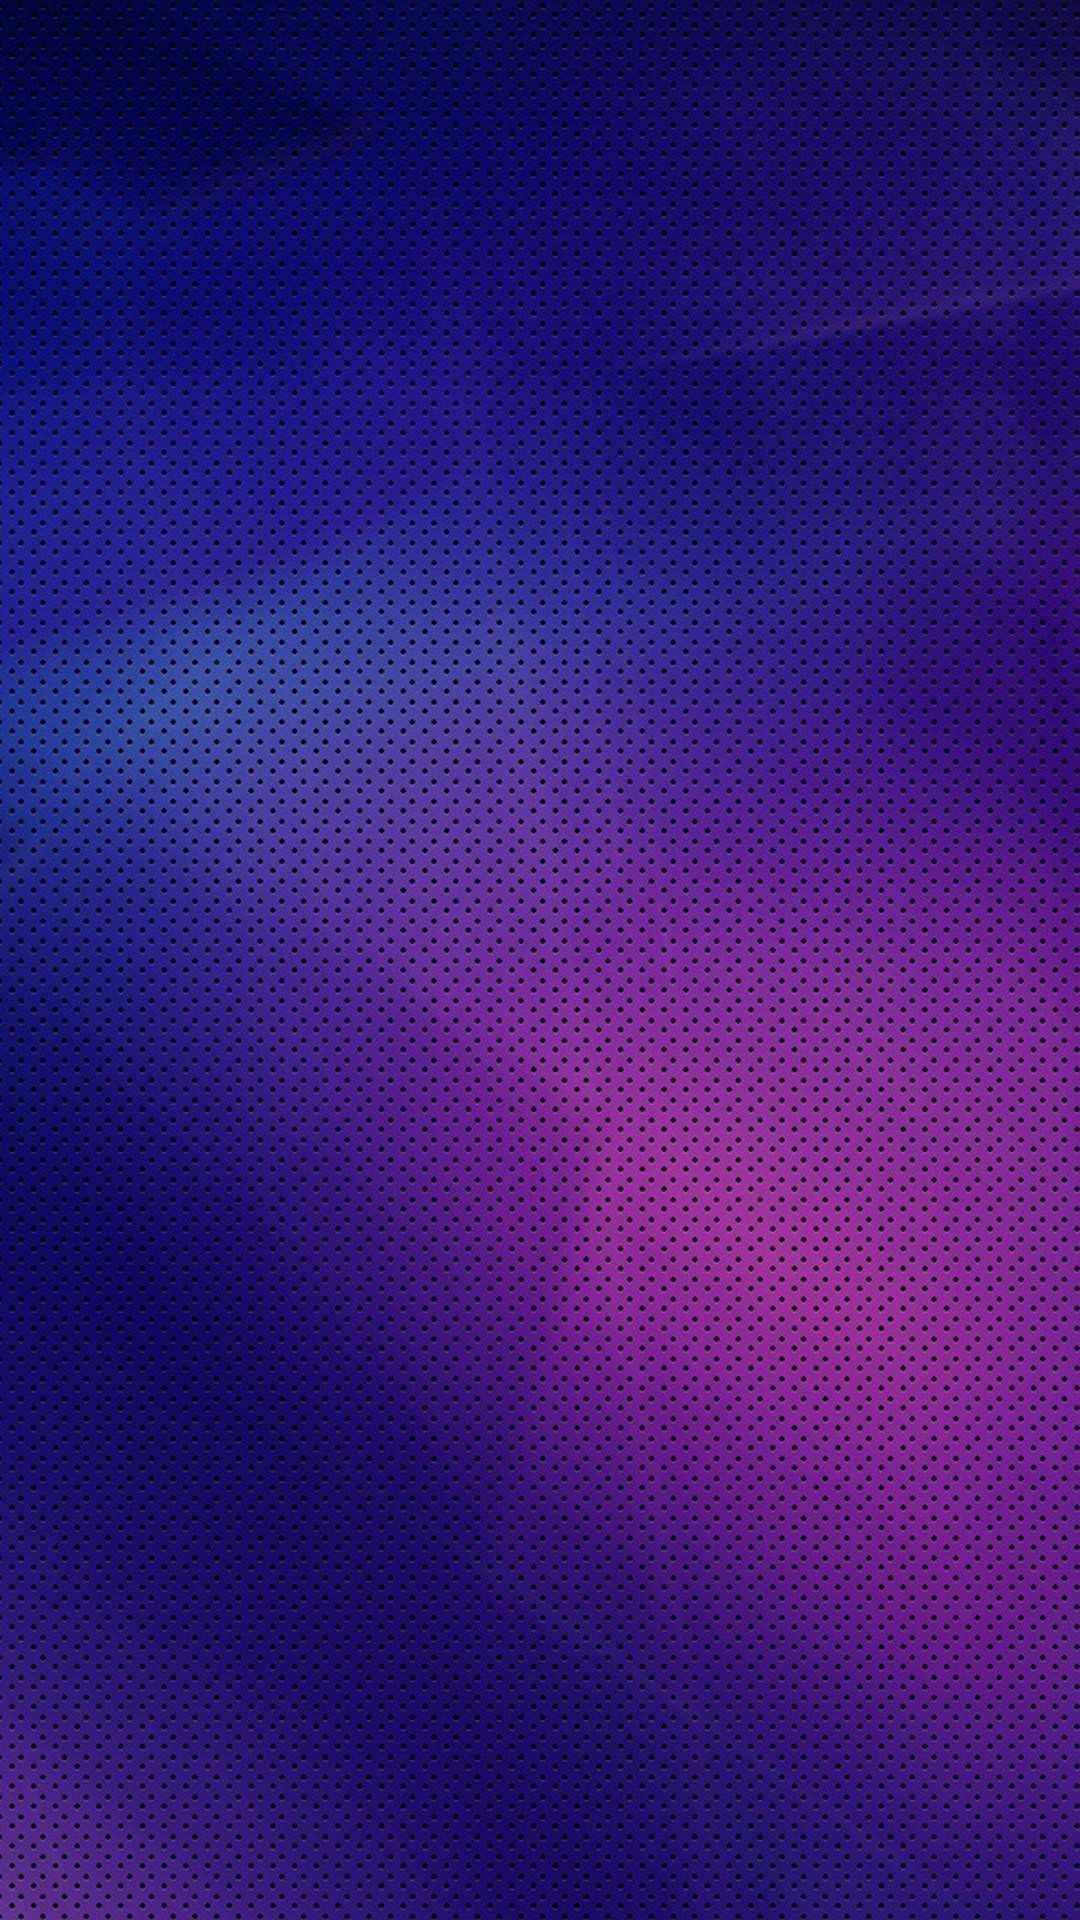 Blue Purple Iphone Wallpaper